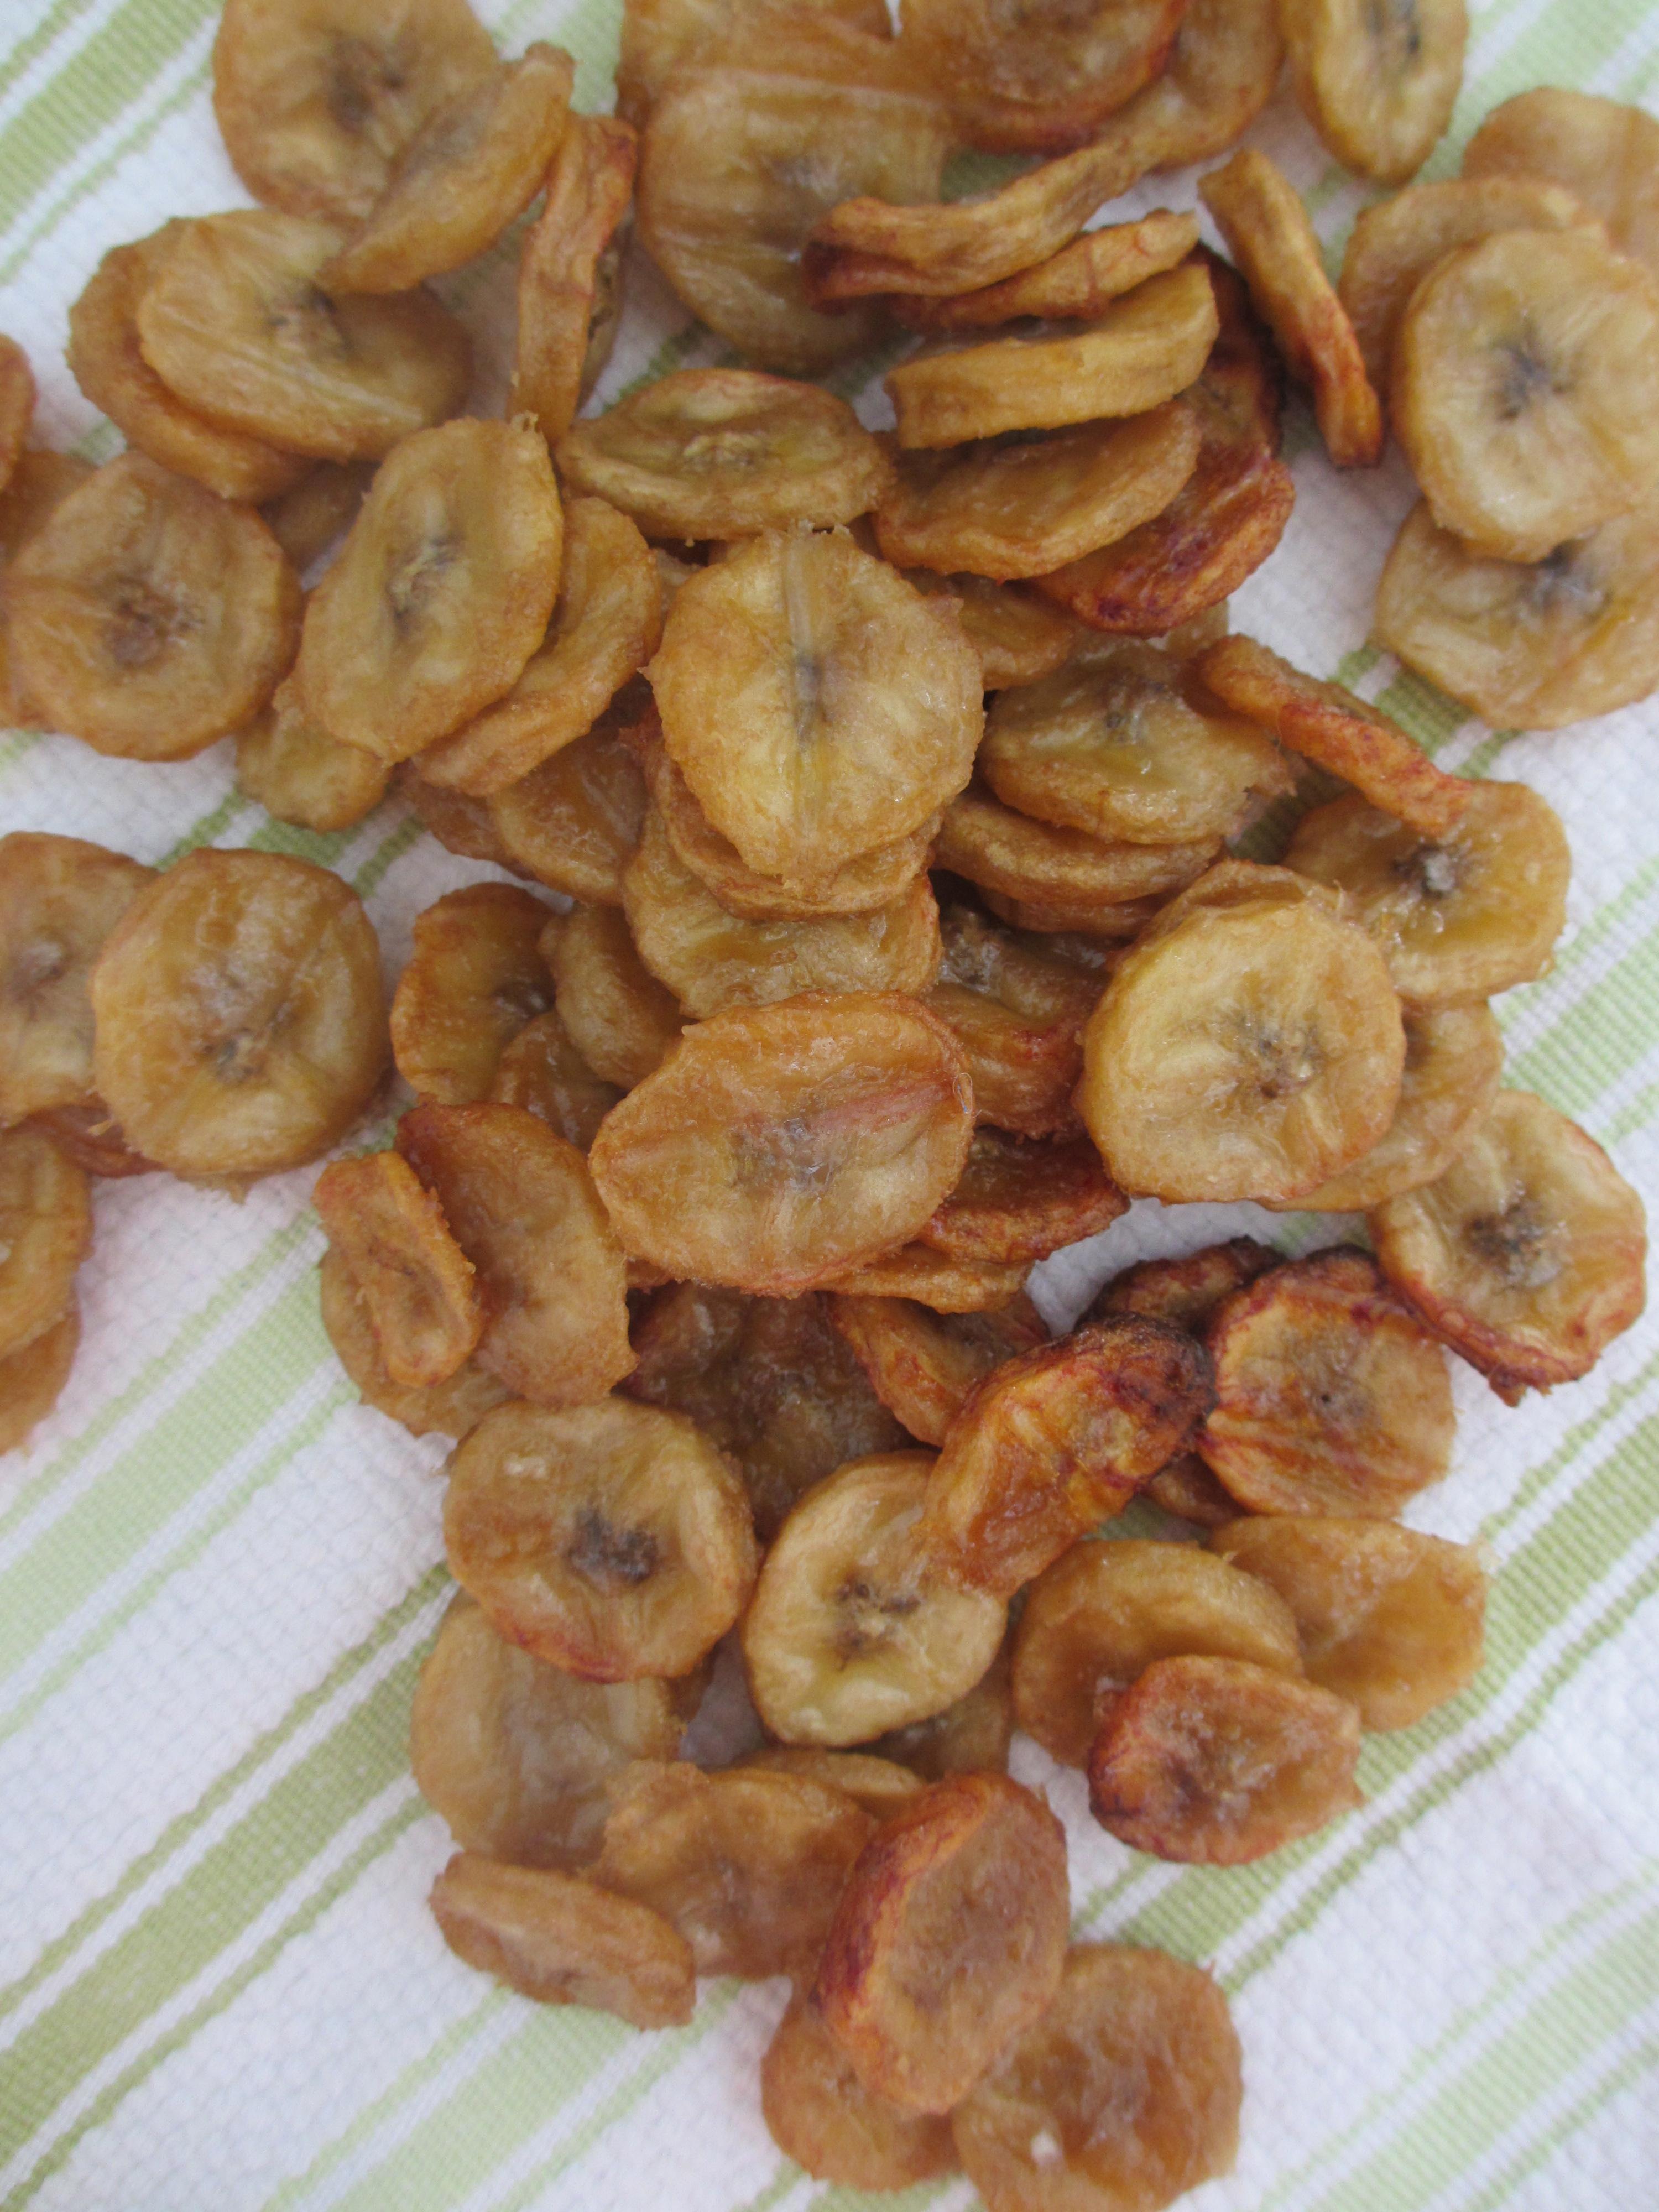 Baked Banana Chips by somethingwewhippedup.com